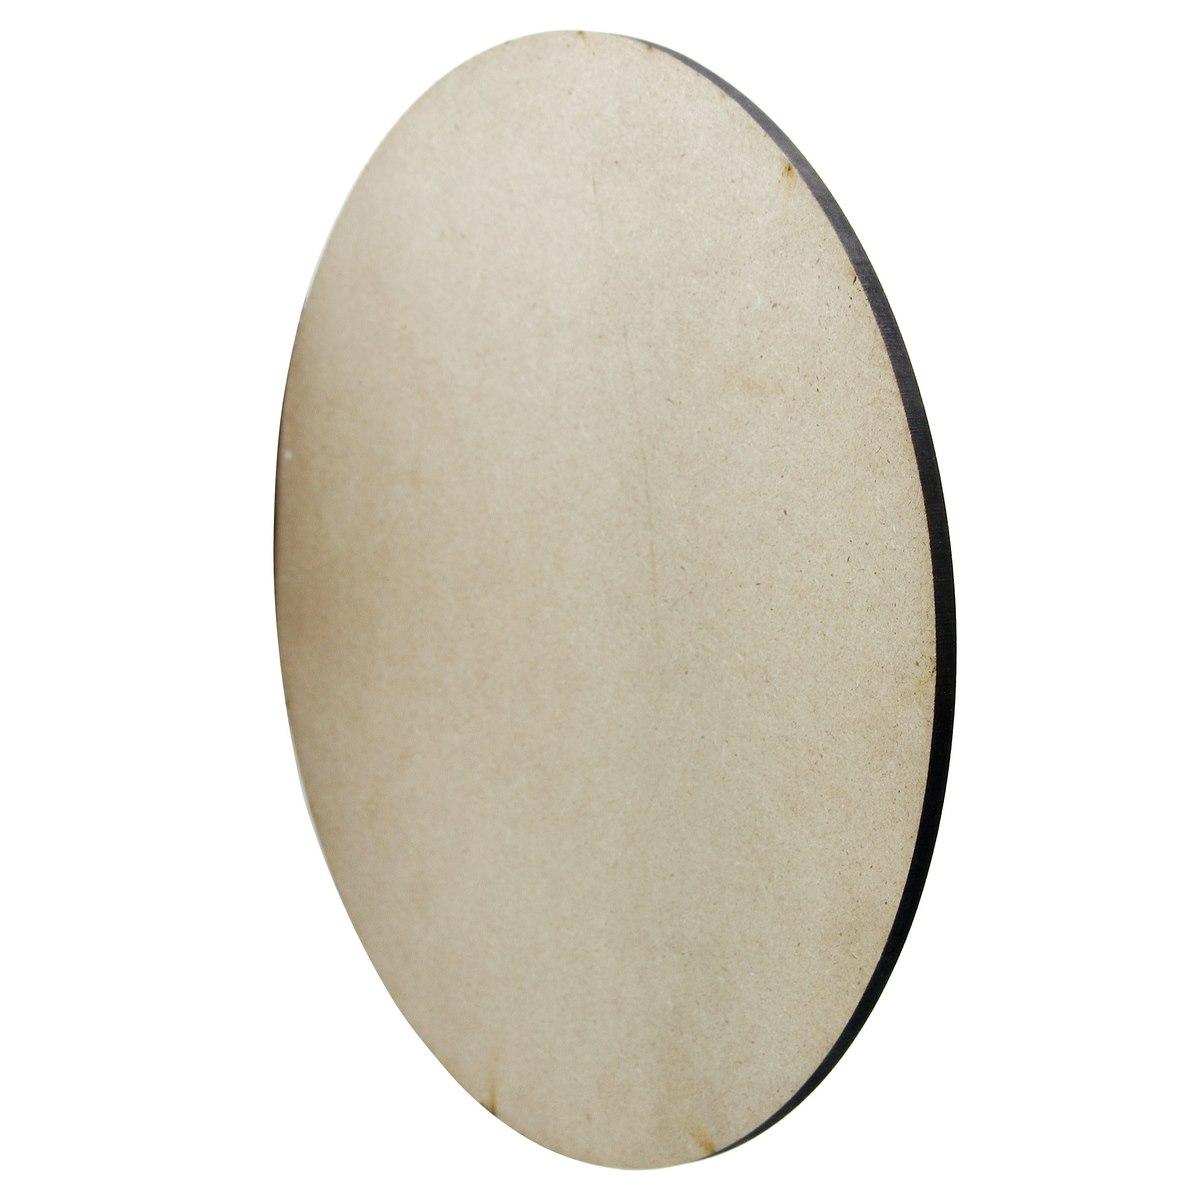 MDF Plate Round 4MM Size:12X12 Set Of 1 Pcs (MPR1200)